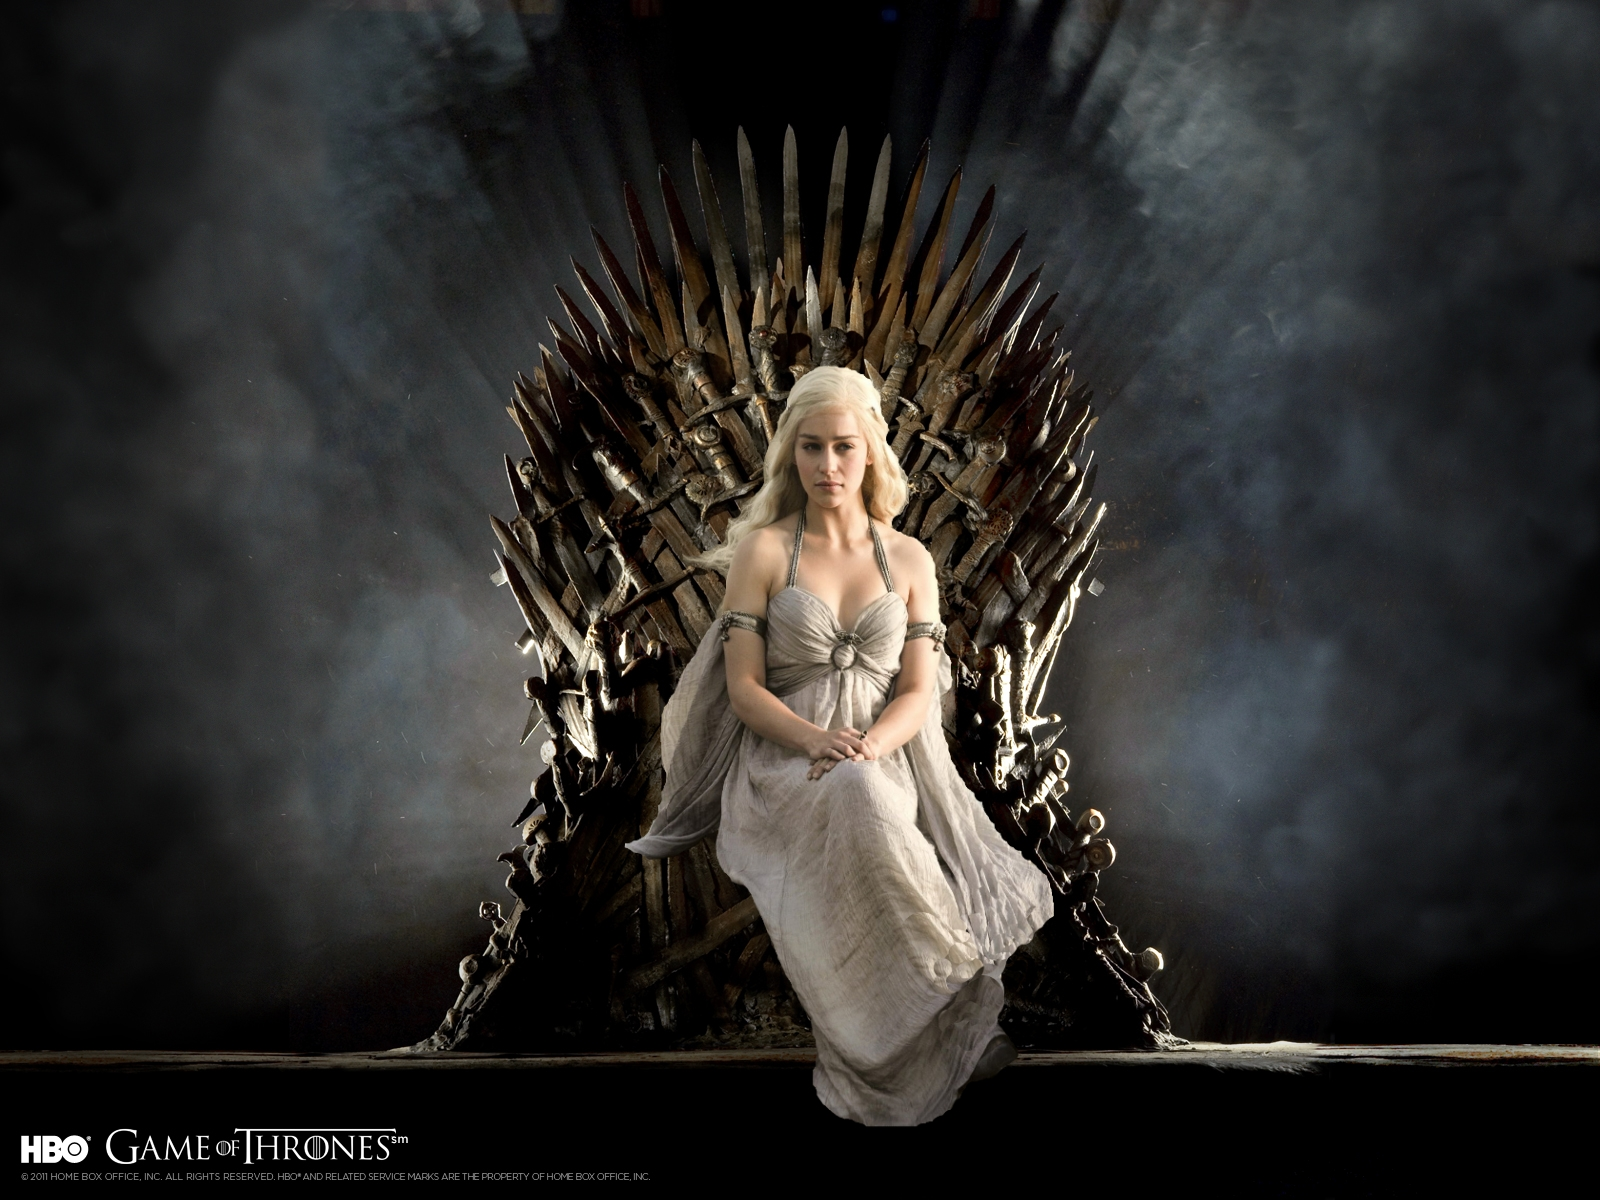 Game Of Thrones Widescreen Wallpapers   Facebook Cover   PoPoPicscom 1600x1200